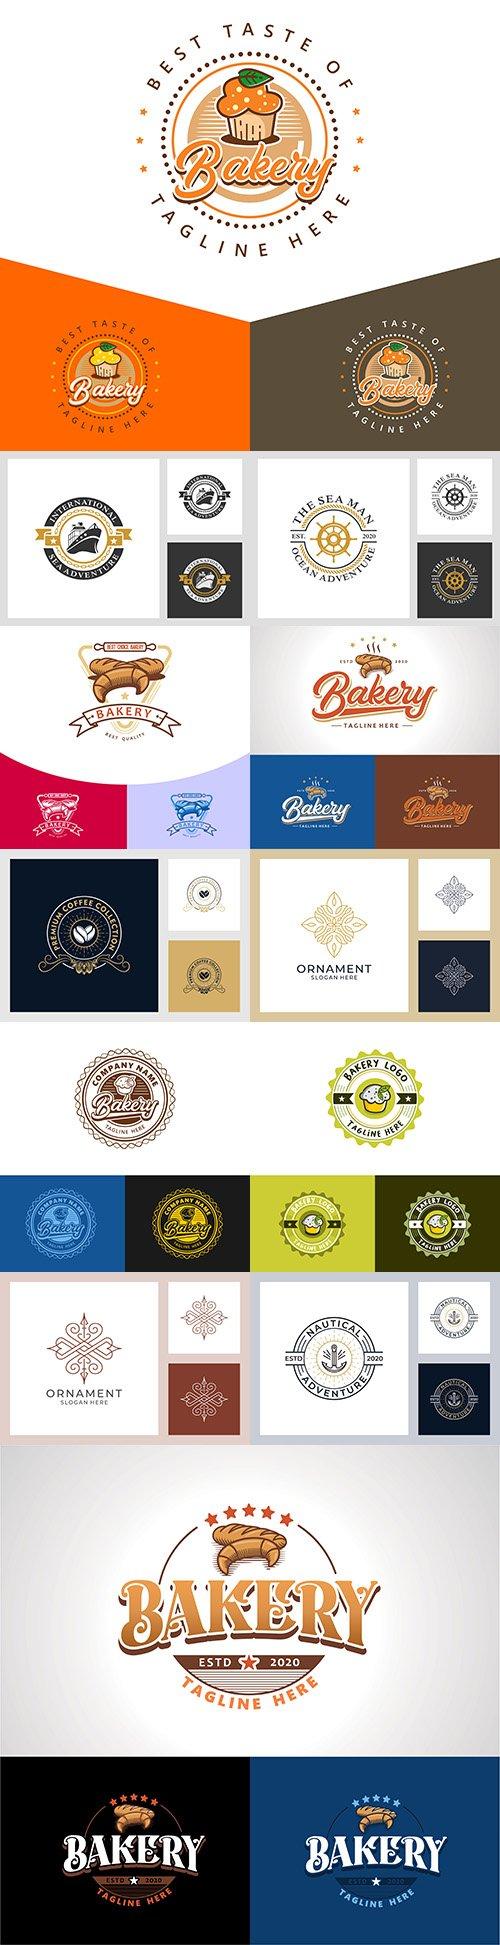 Minimalist elegant logo and business card design 12